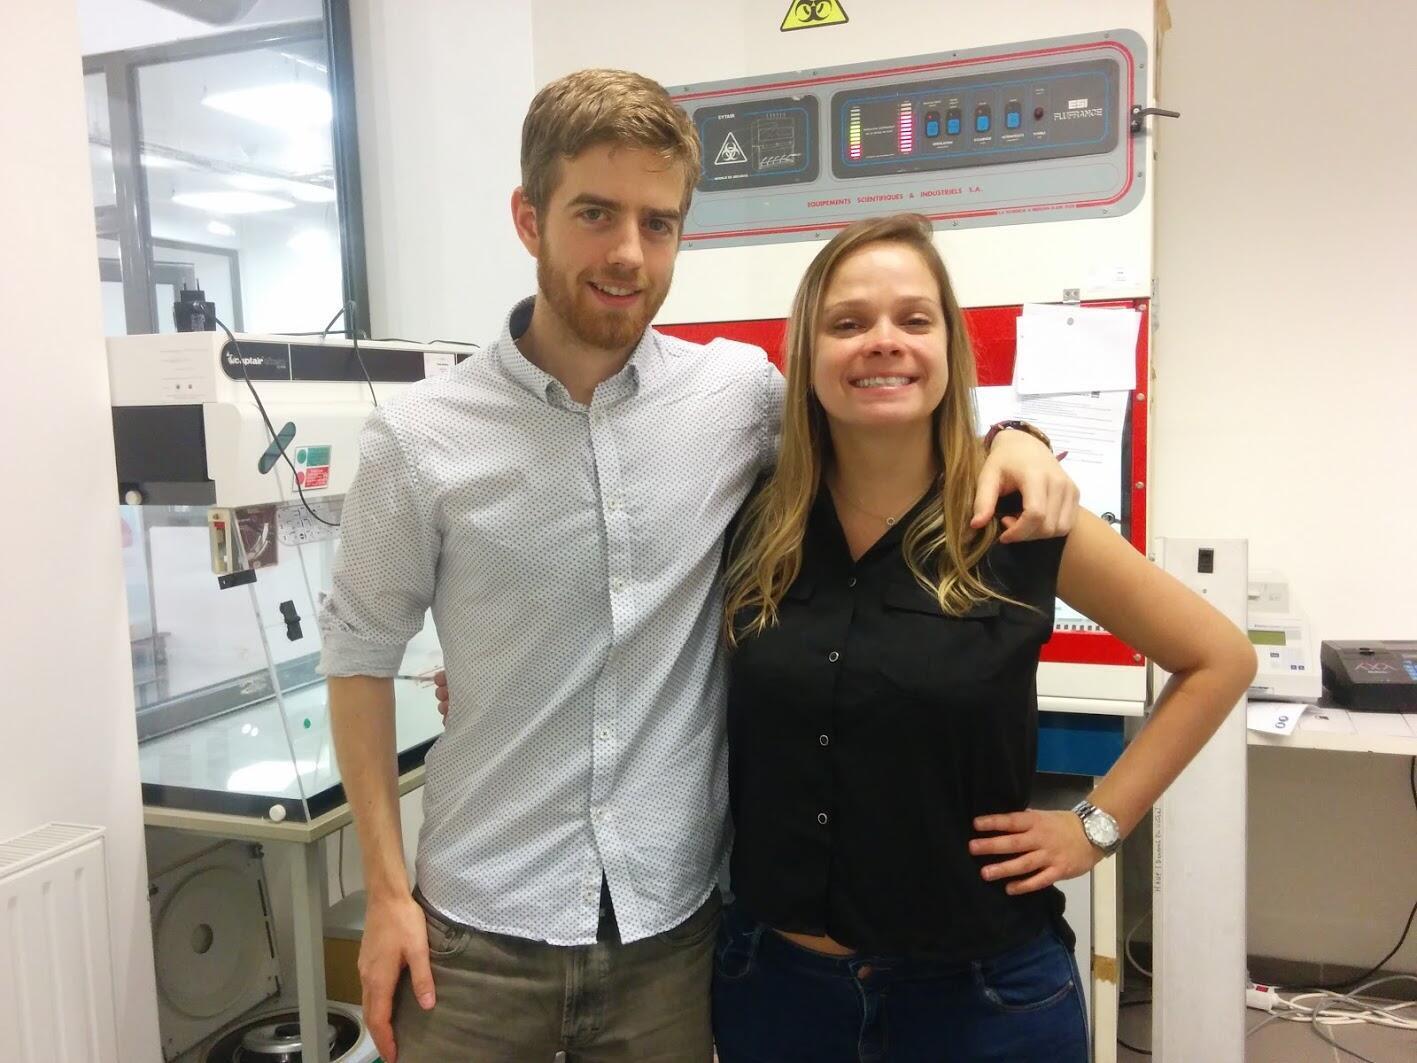 Emmanuel Thiéry e Mariana Bittencourt, membros da start-up Cophenol